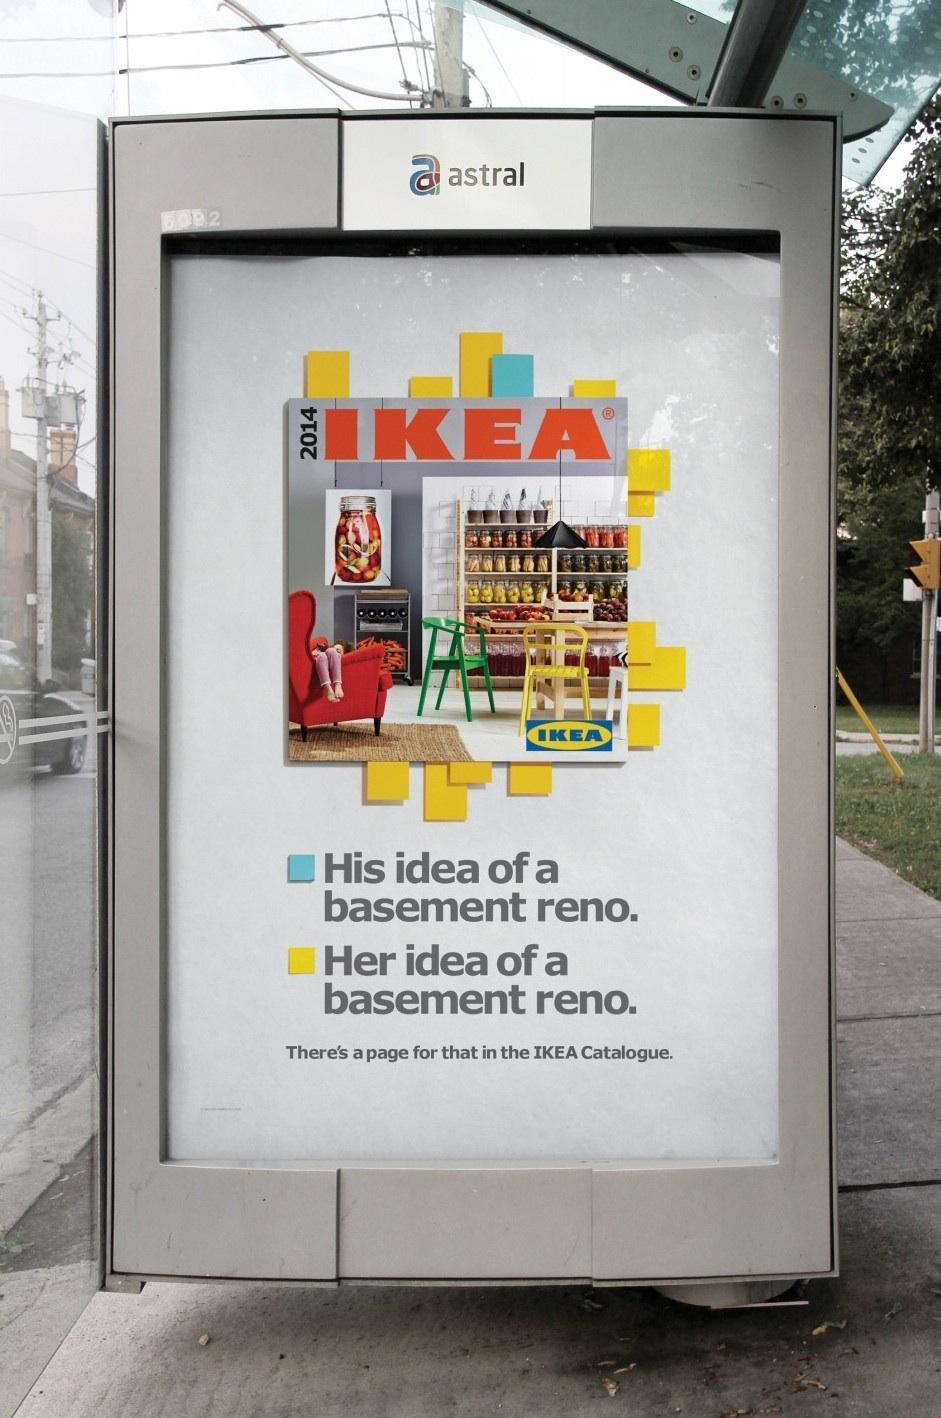 IKEA Outdoor Ad -  Basement reno